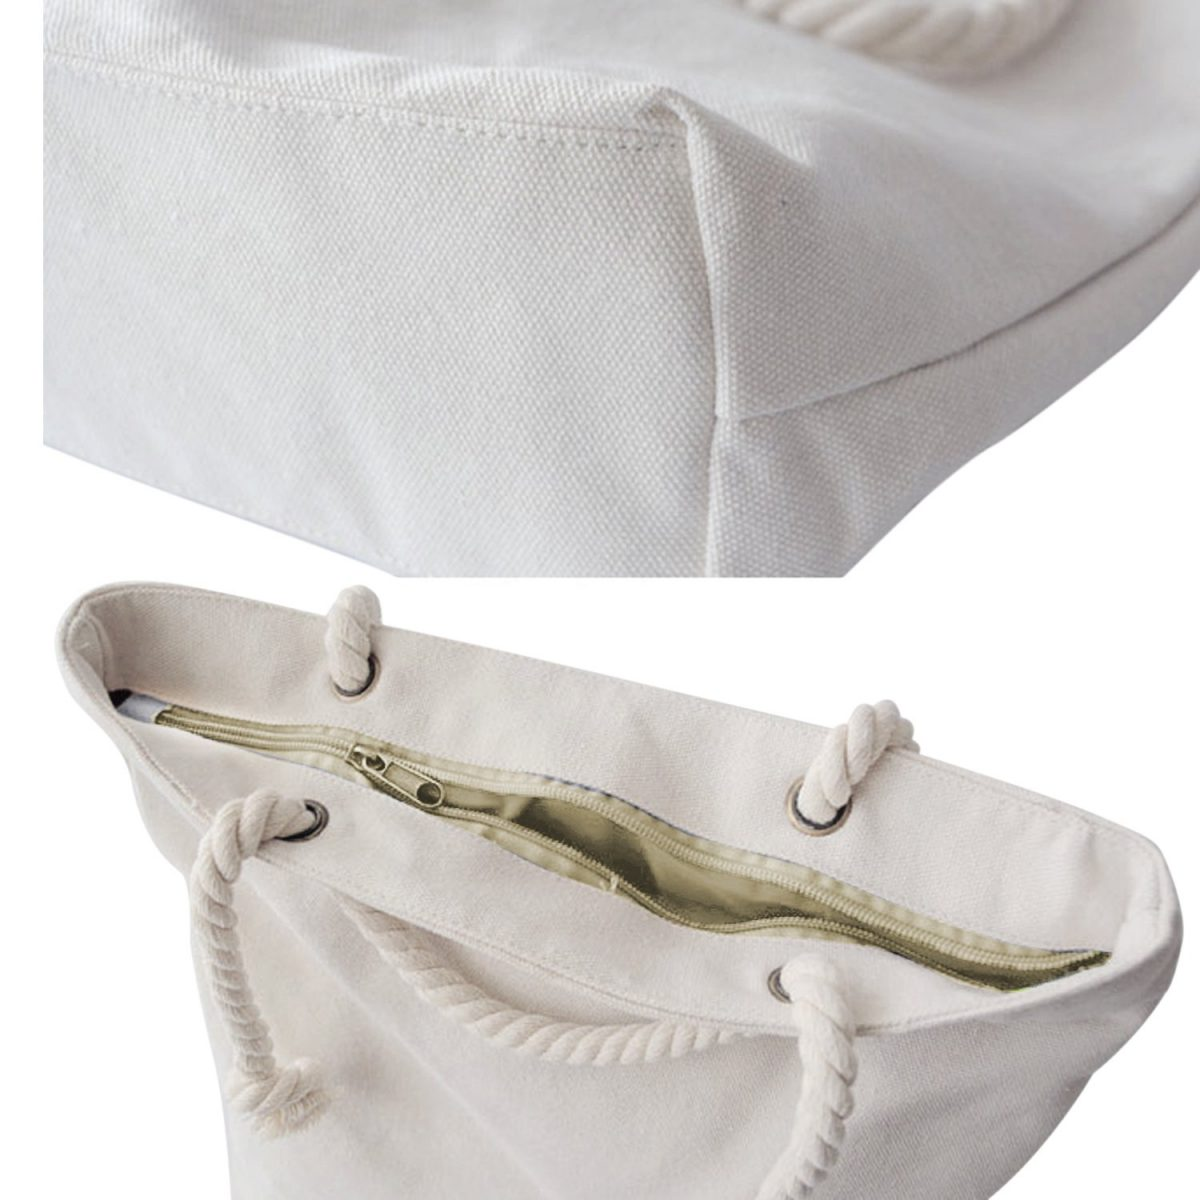 Hello Summer Özel Tasarımlı Fermuarlı Dijital Kumaş Çanta Realhomes